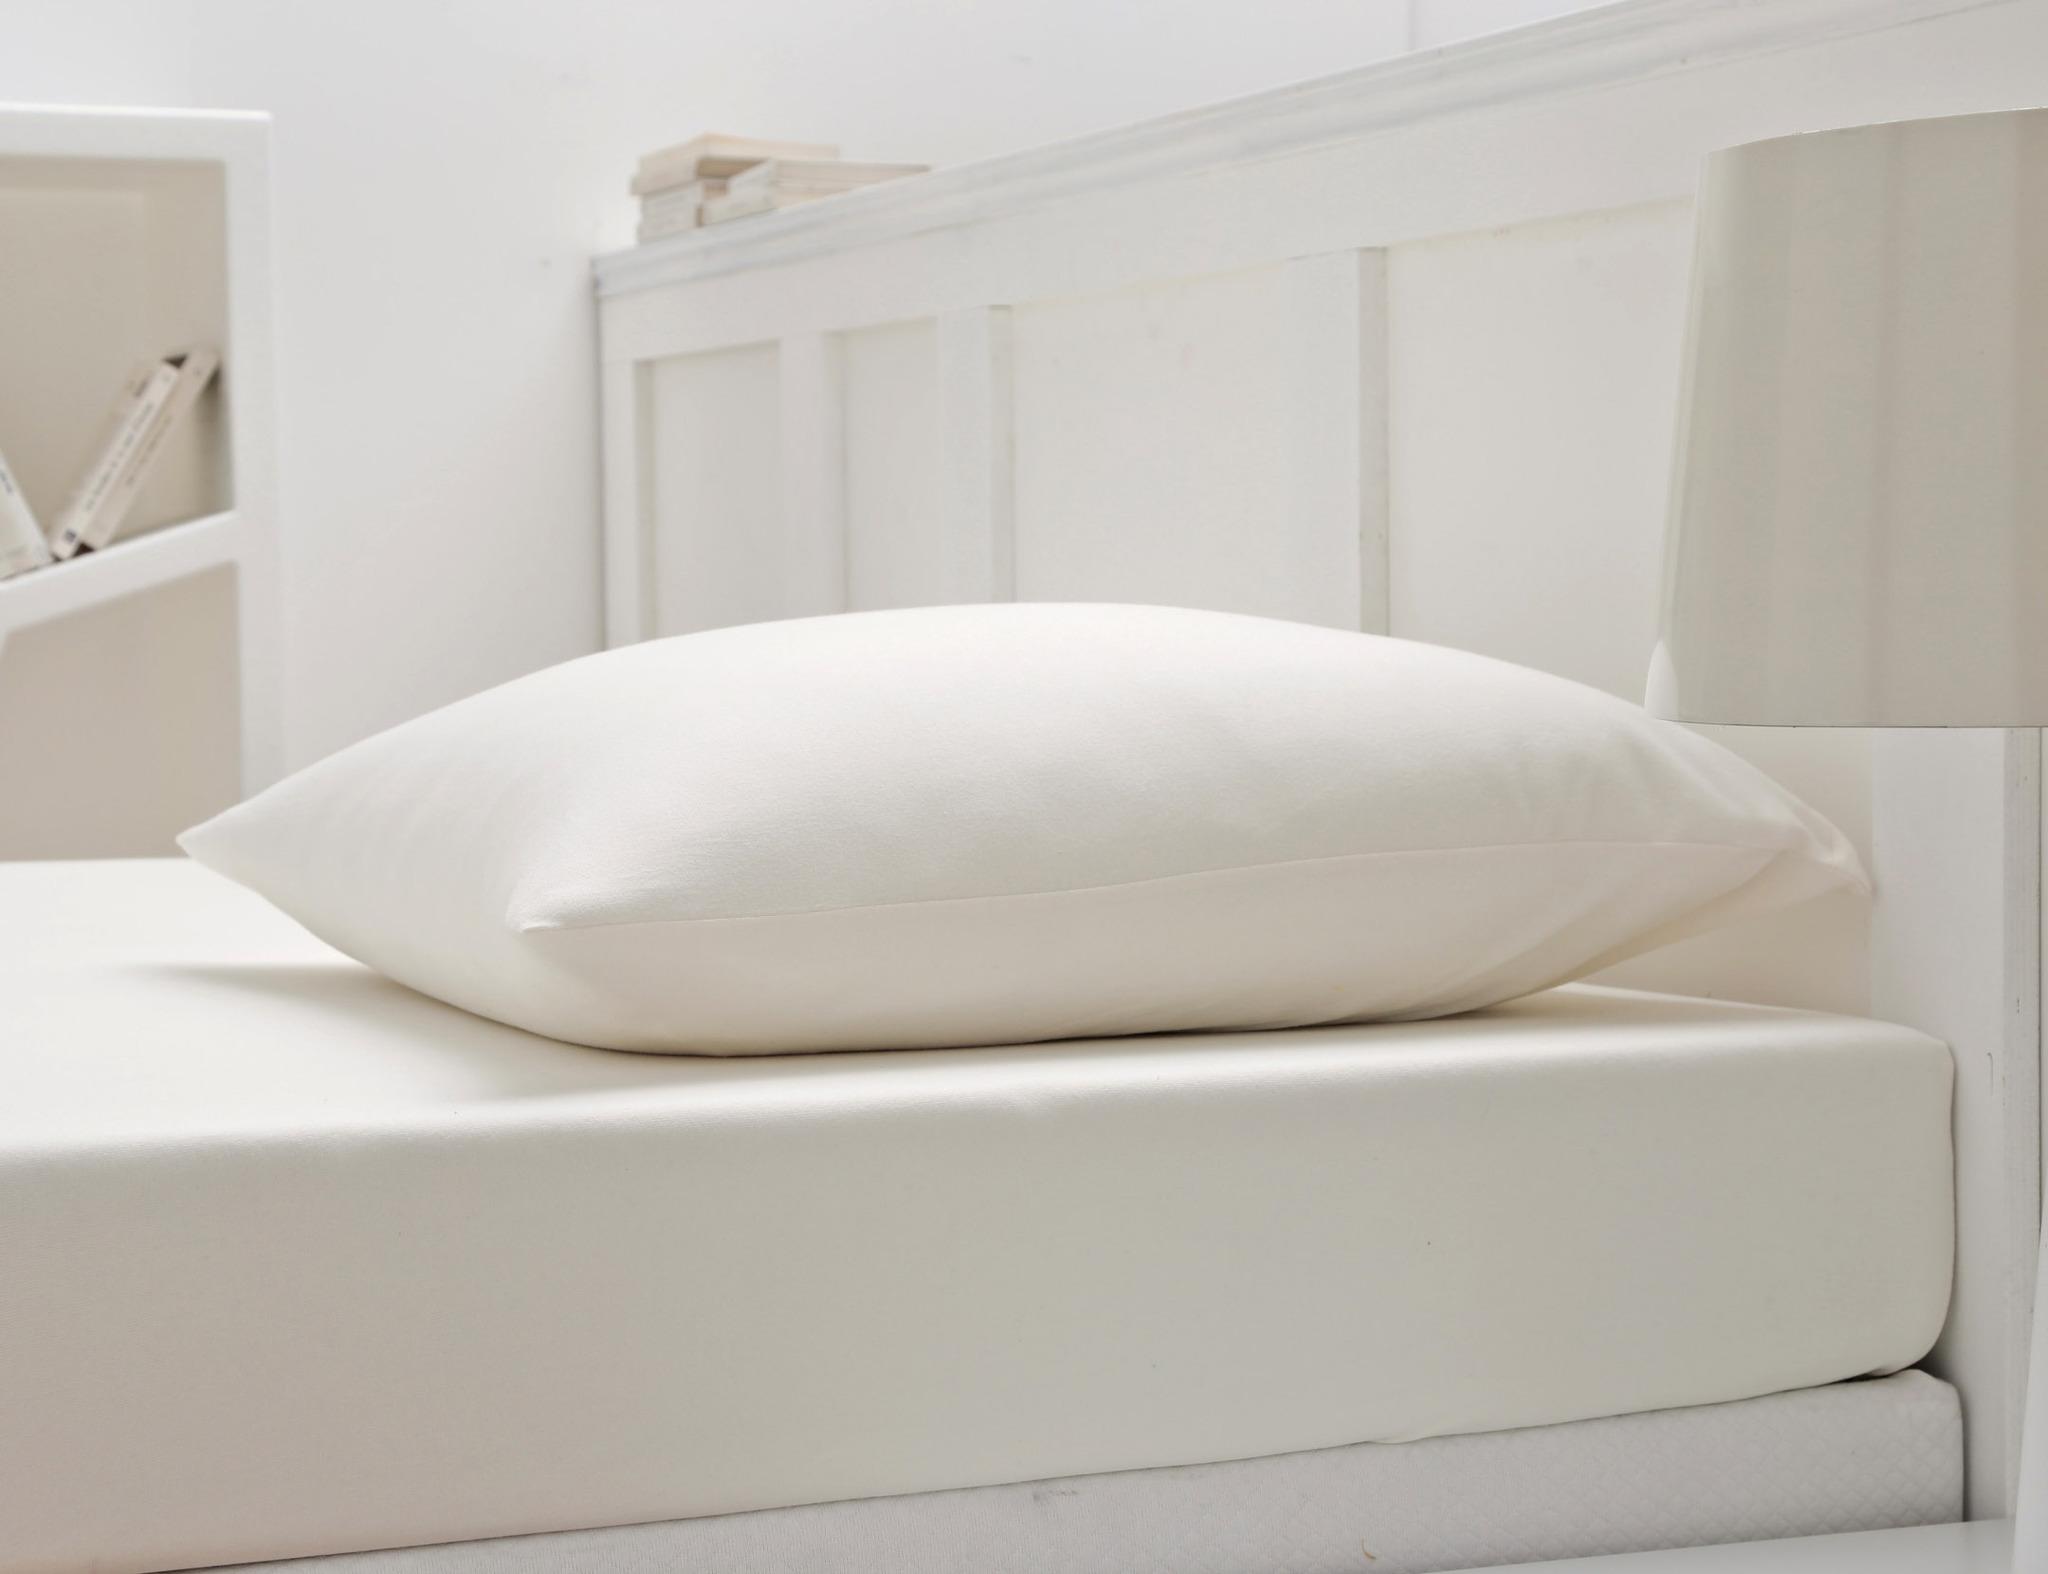 На резинке Простыня на резинке 180x200 Blanc des Vosges джерси молочная prostynya-na-rezinke-180x200-blanc-des-vosges-dzhersi-molochnaya-frantsiya.jpg